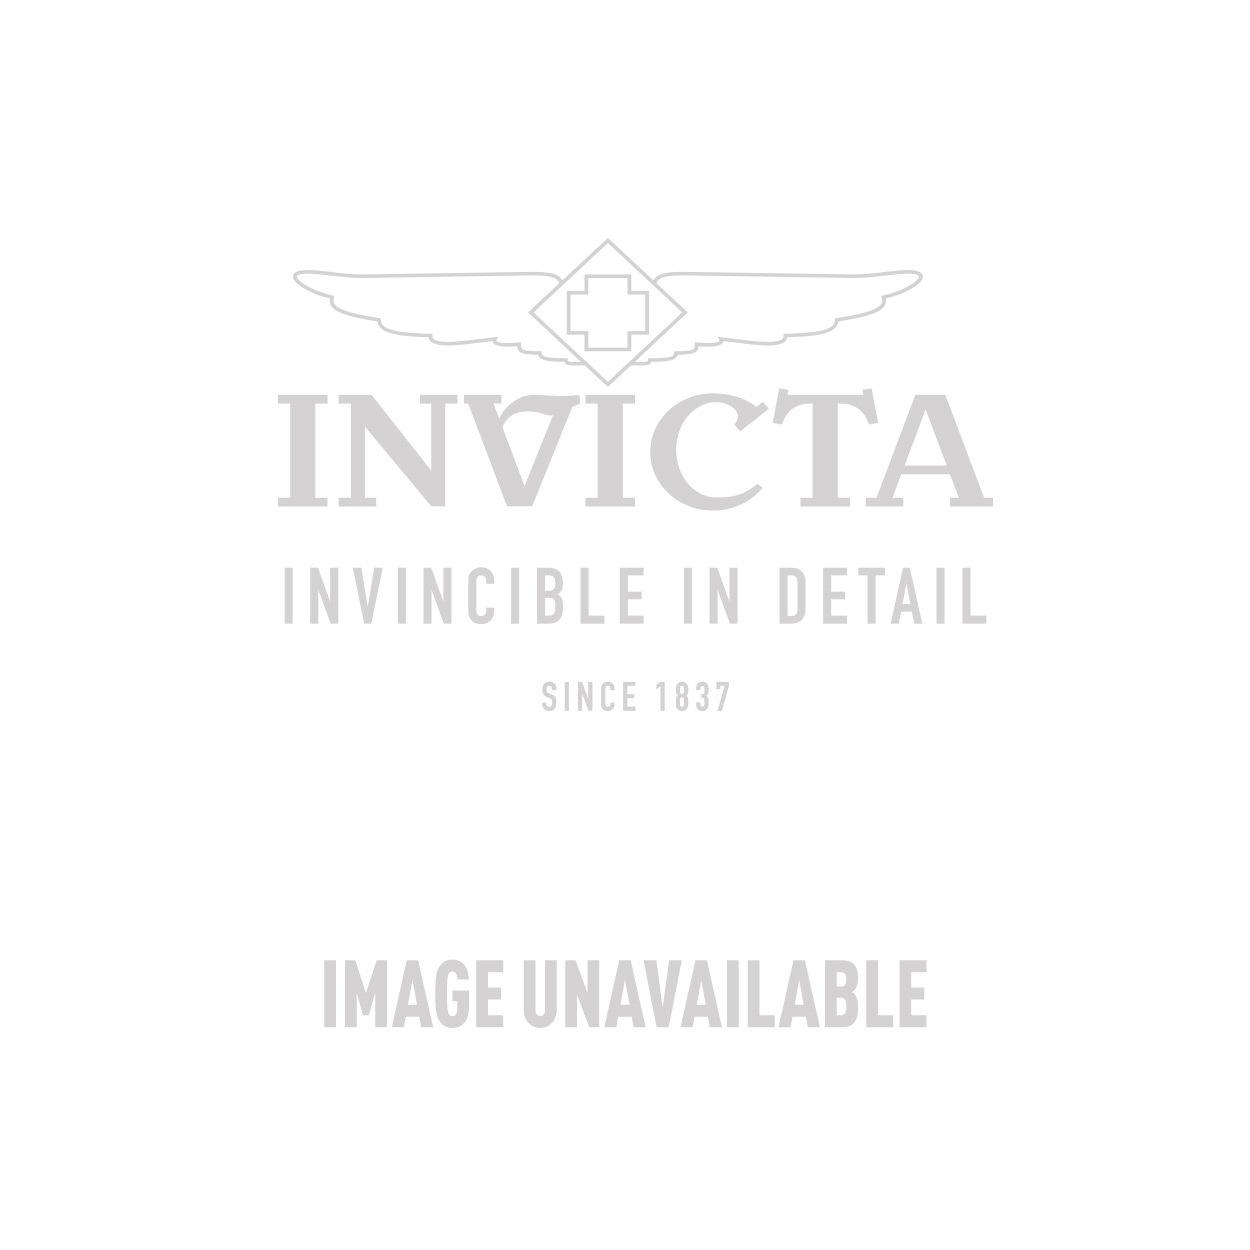 Invicta Sea Base  Quartz Watch - Rose Gold, Titanium case with Black tone Polyurethane band - Model 14260